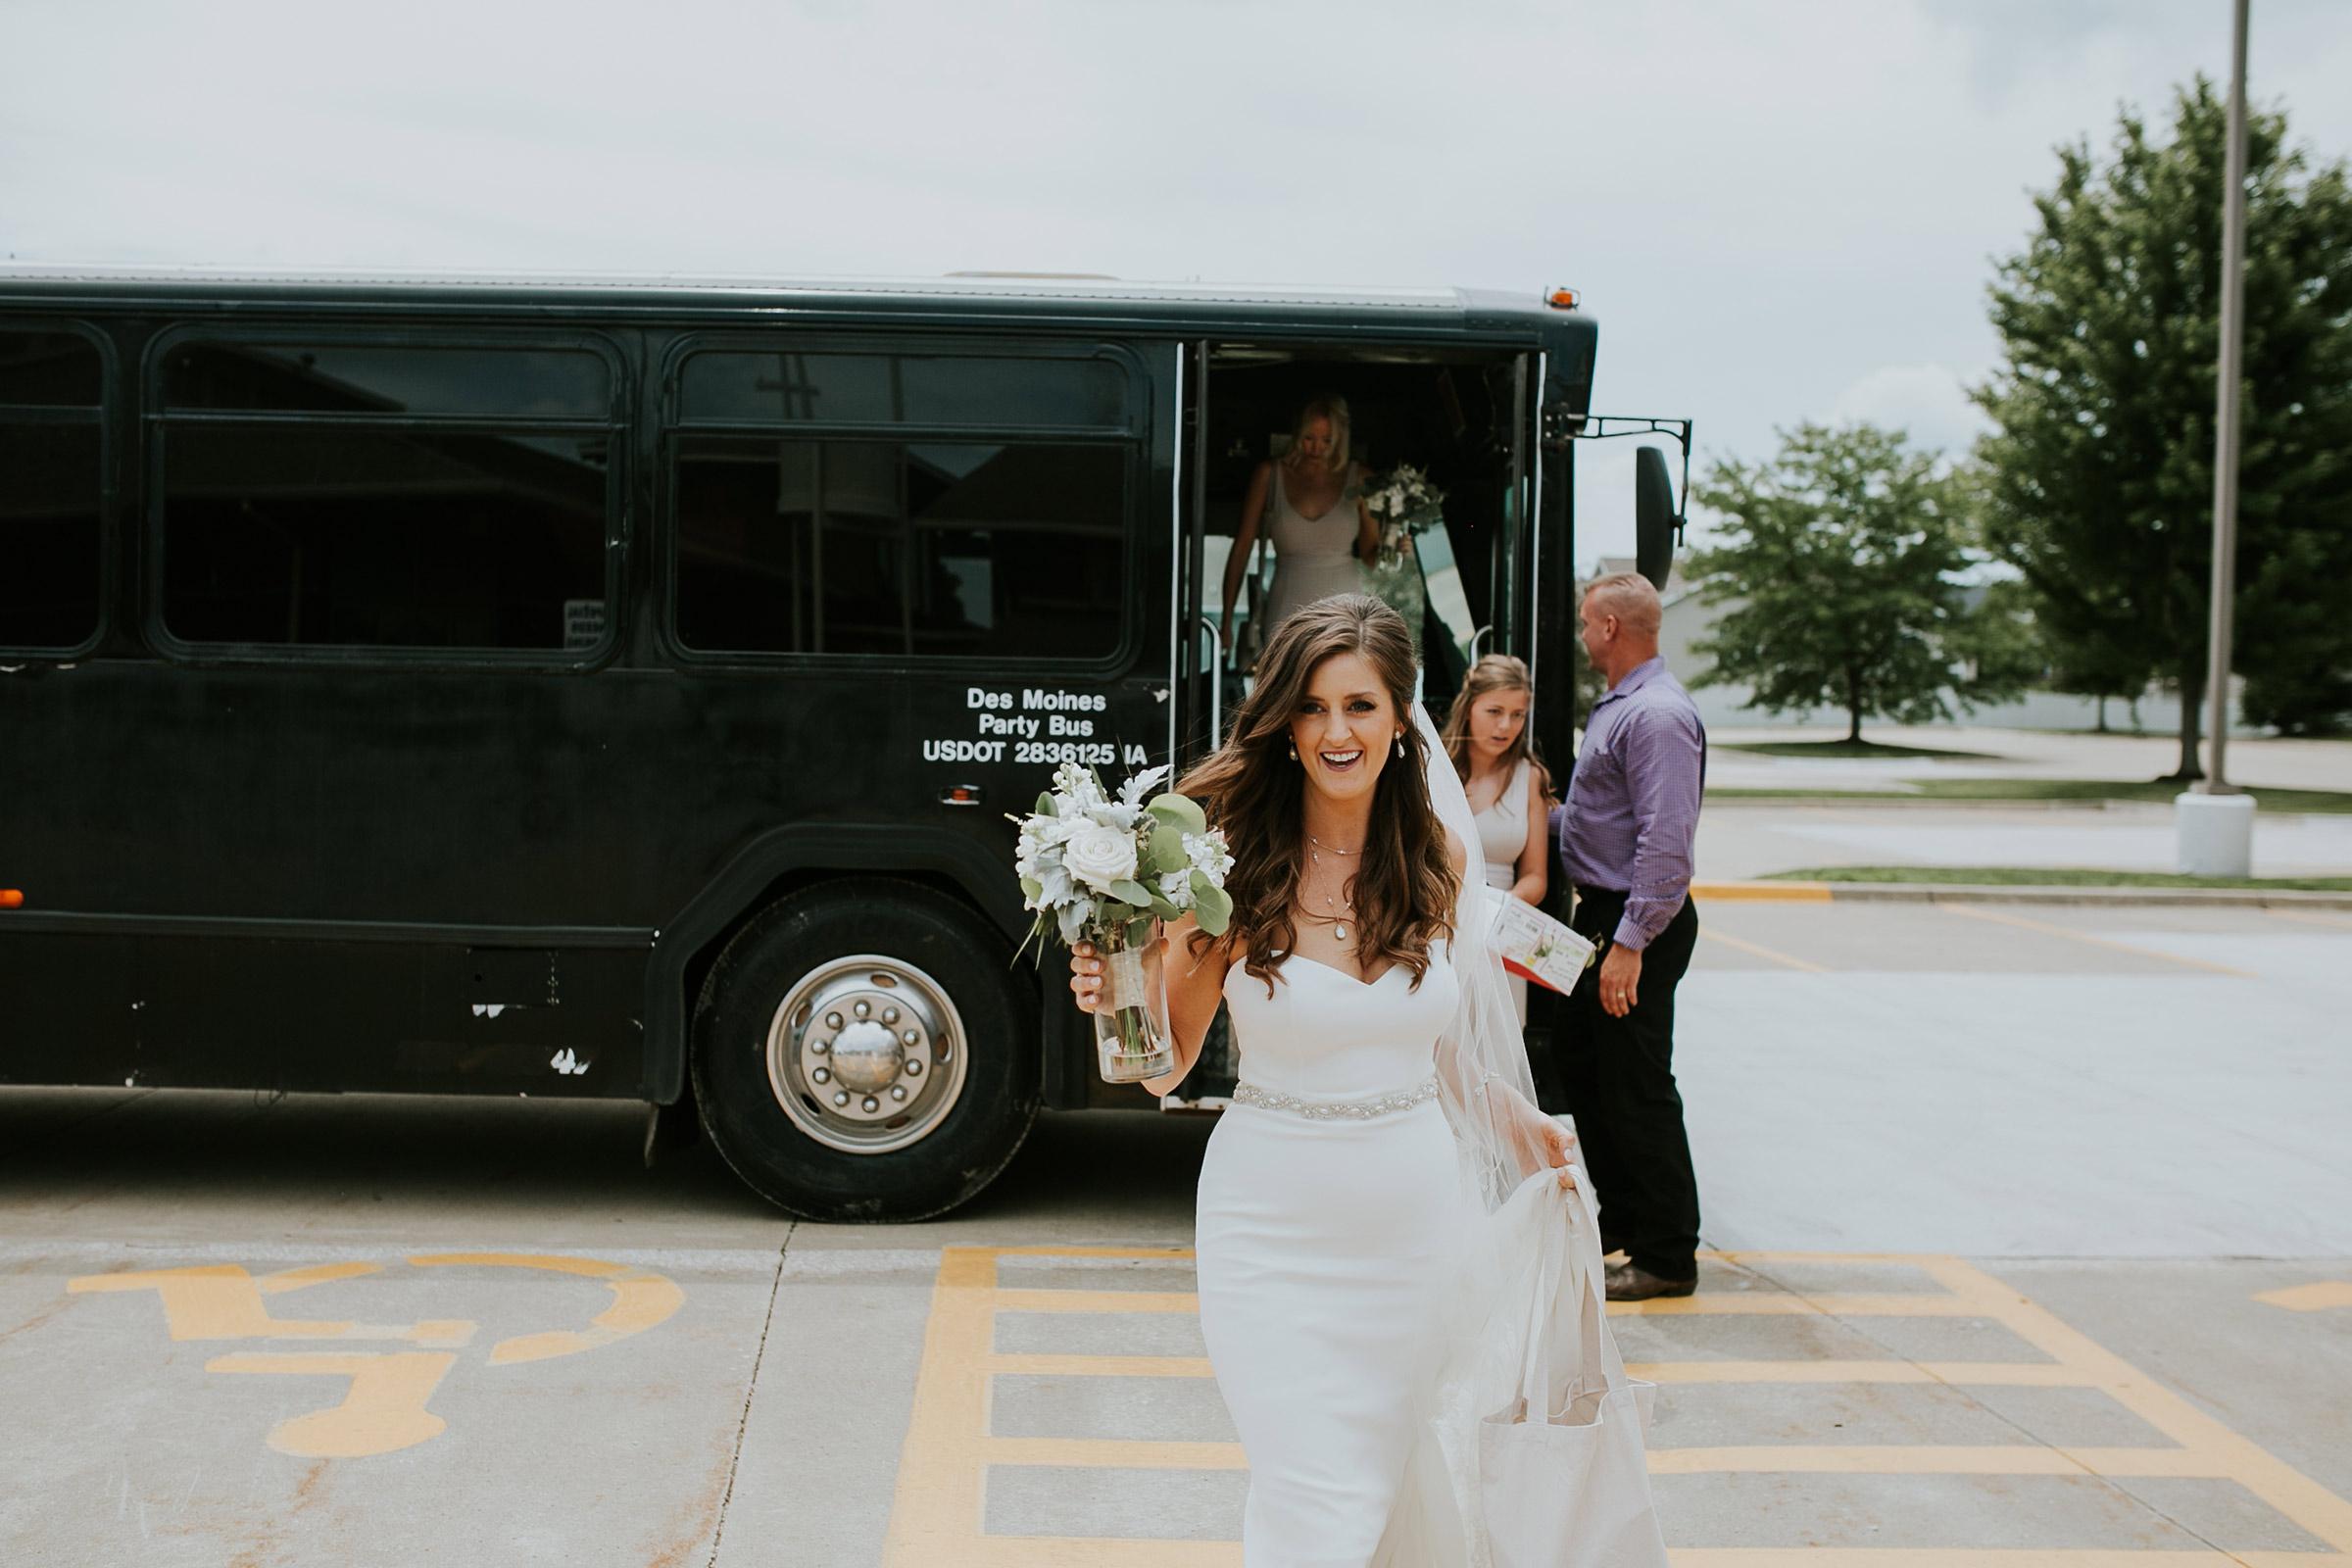 mr-mrs-hull-bride-walking-off-bus-desmoines-iowa-raelyn-ramey-photography-178.jpg